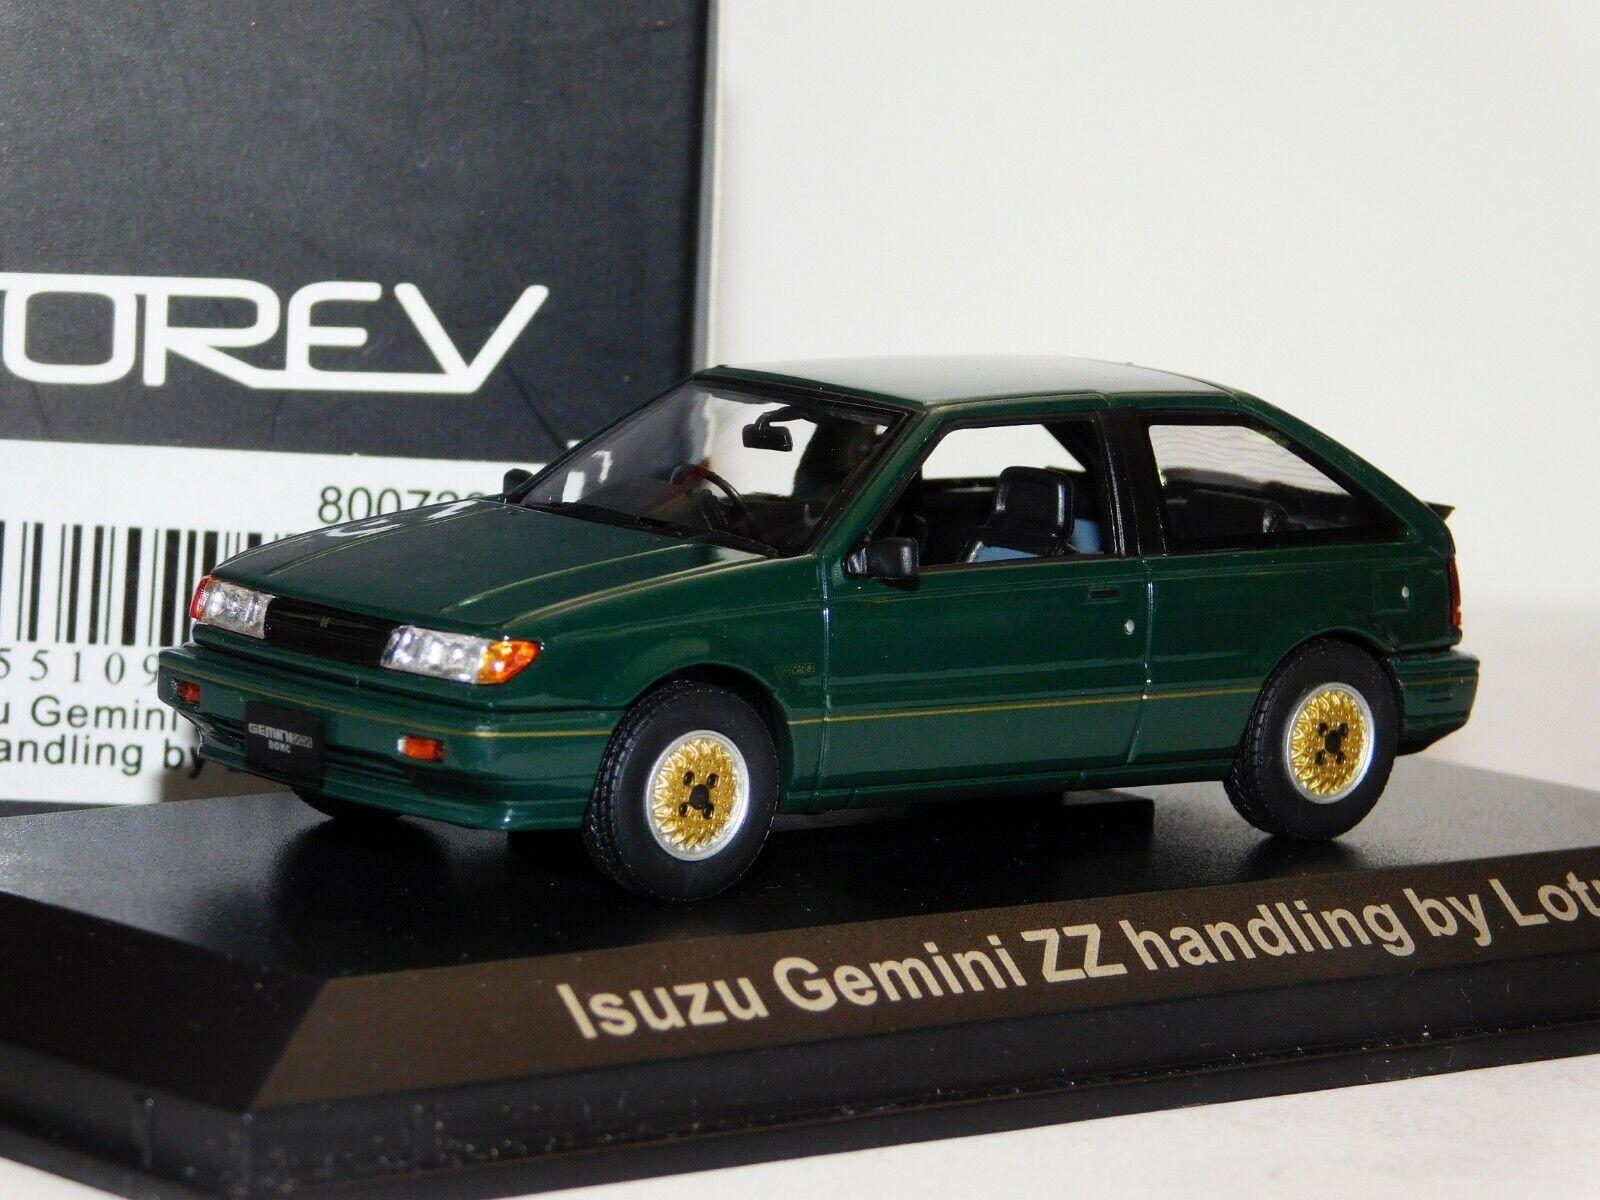 ISUZU GEMINI ZZ 1600 DOHC HANDLING BY LOTUS 1988 GREEN NOREV 800722 1 43